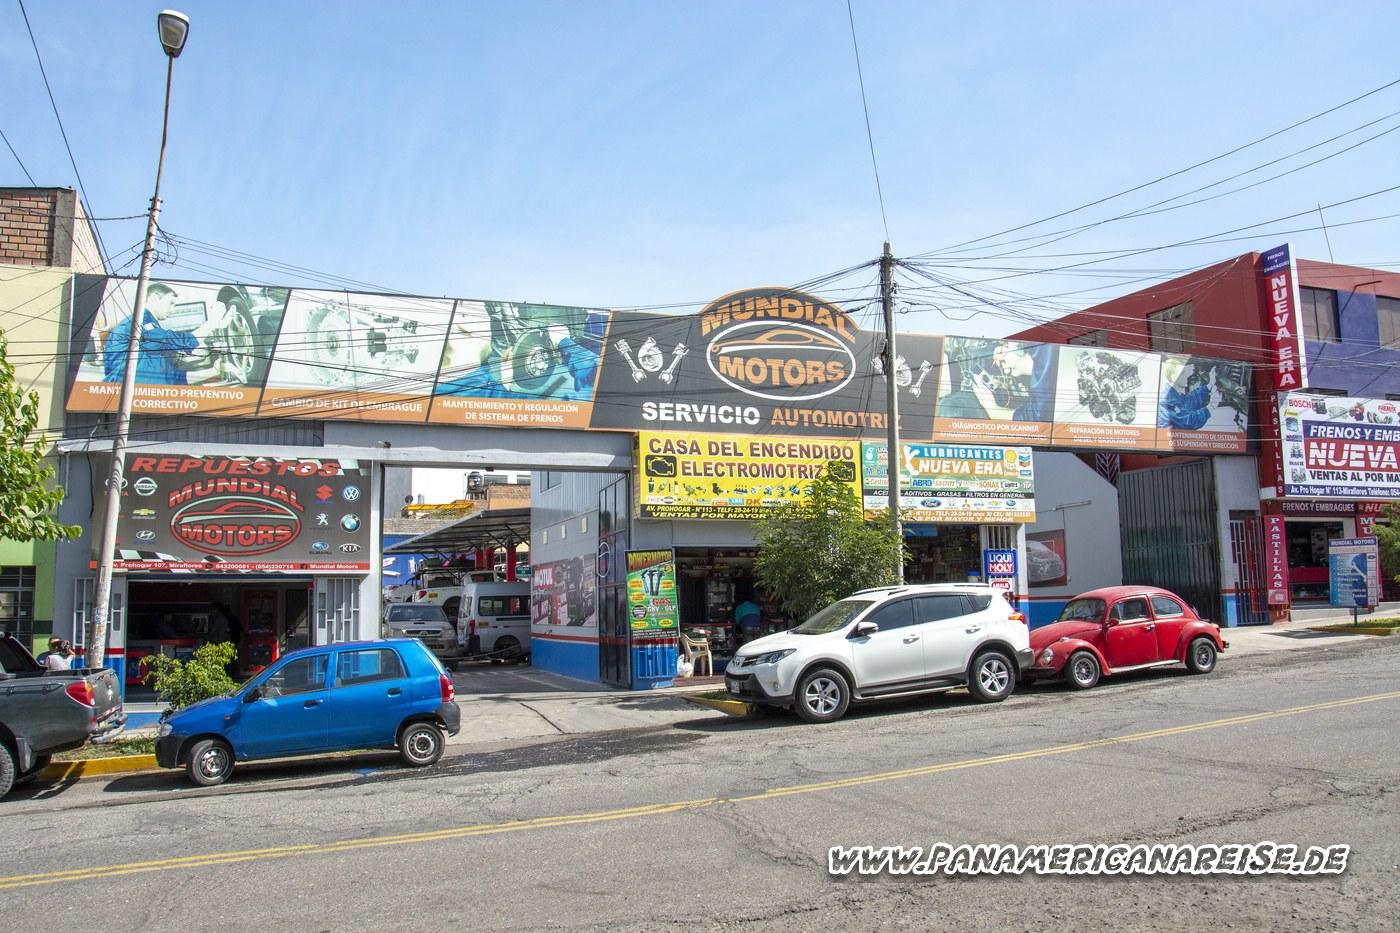 Mundial Motors Arequipa Peru